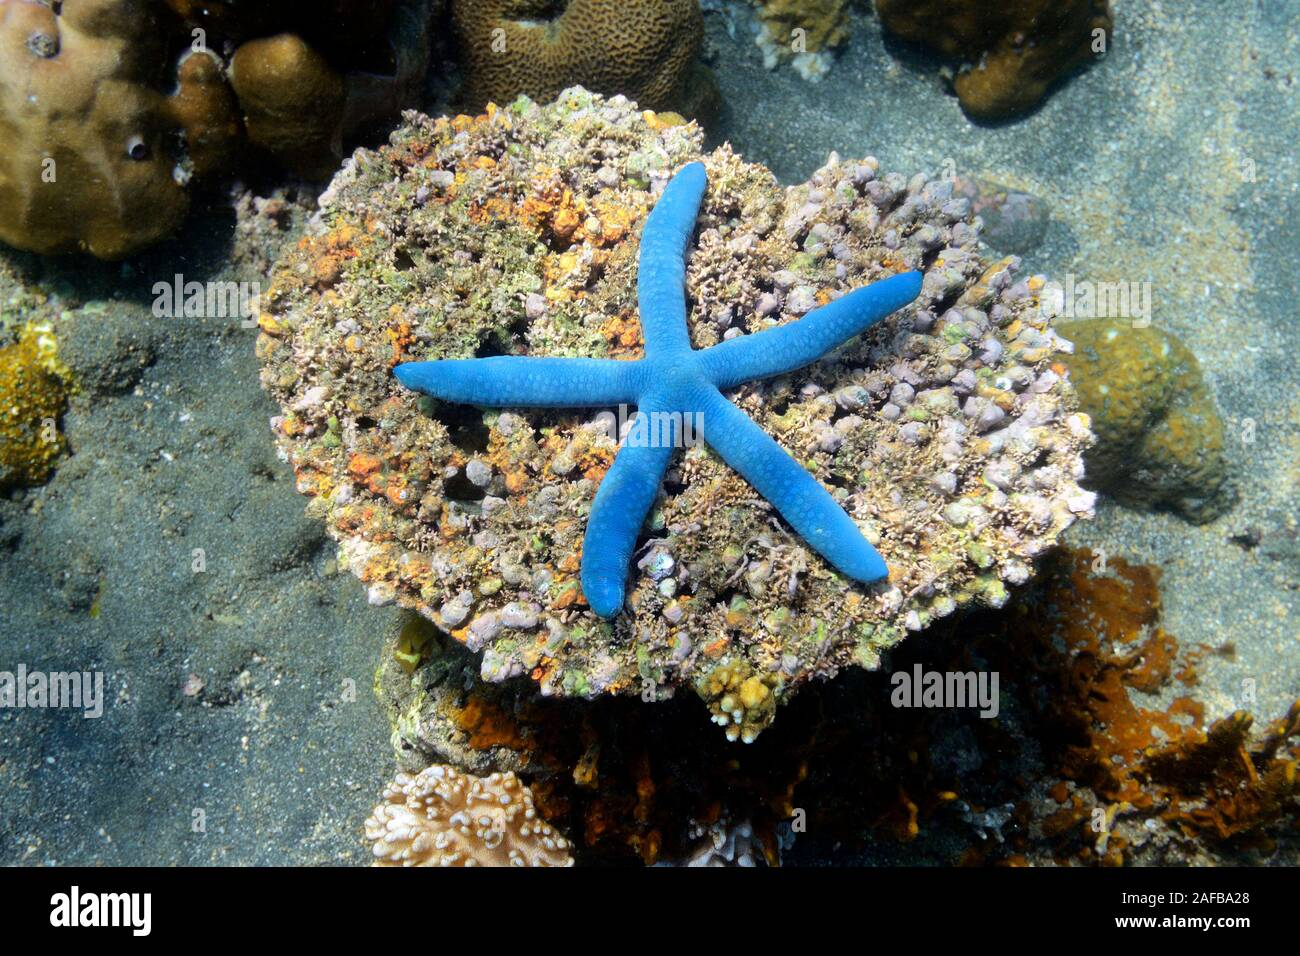 Blauer Seestern (Linckia laevigata), Nordbali, Bali, Indonesien Foto de stock